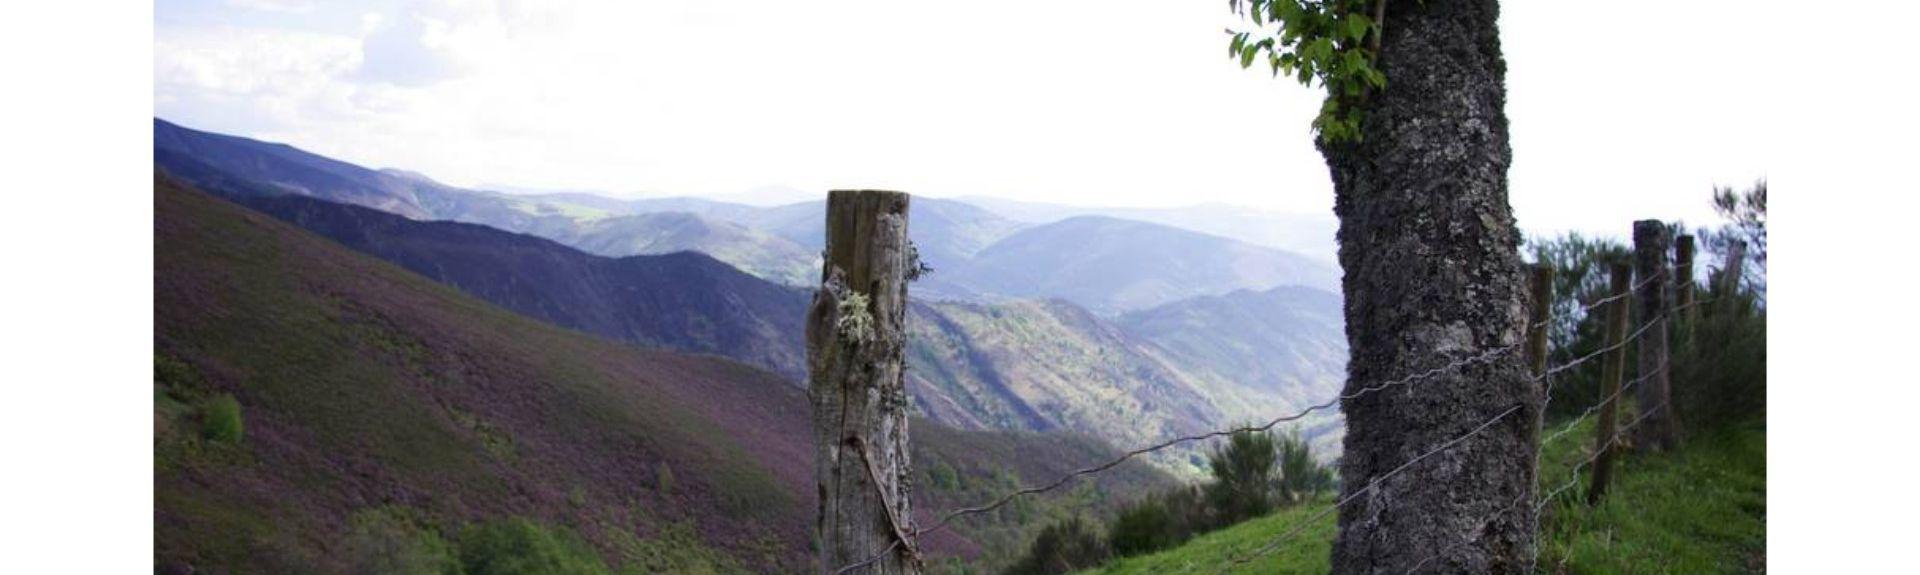 Fonsagrada, Galicia, Spain